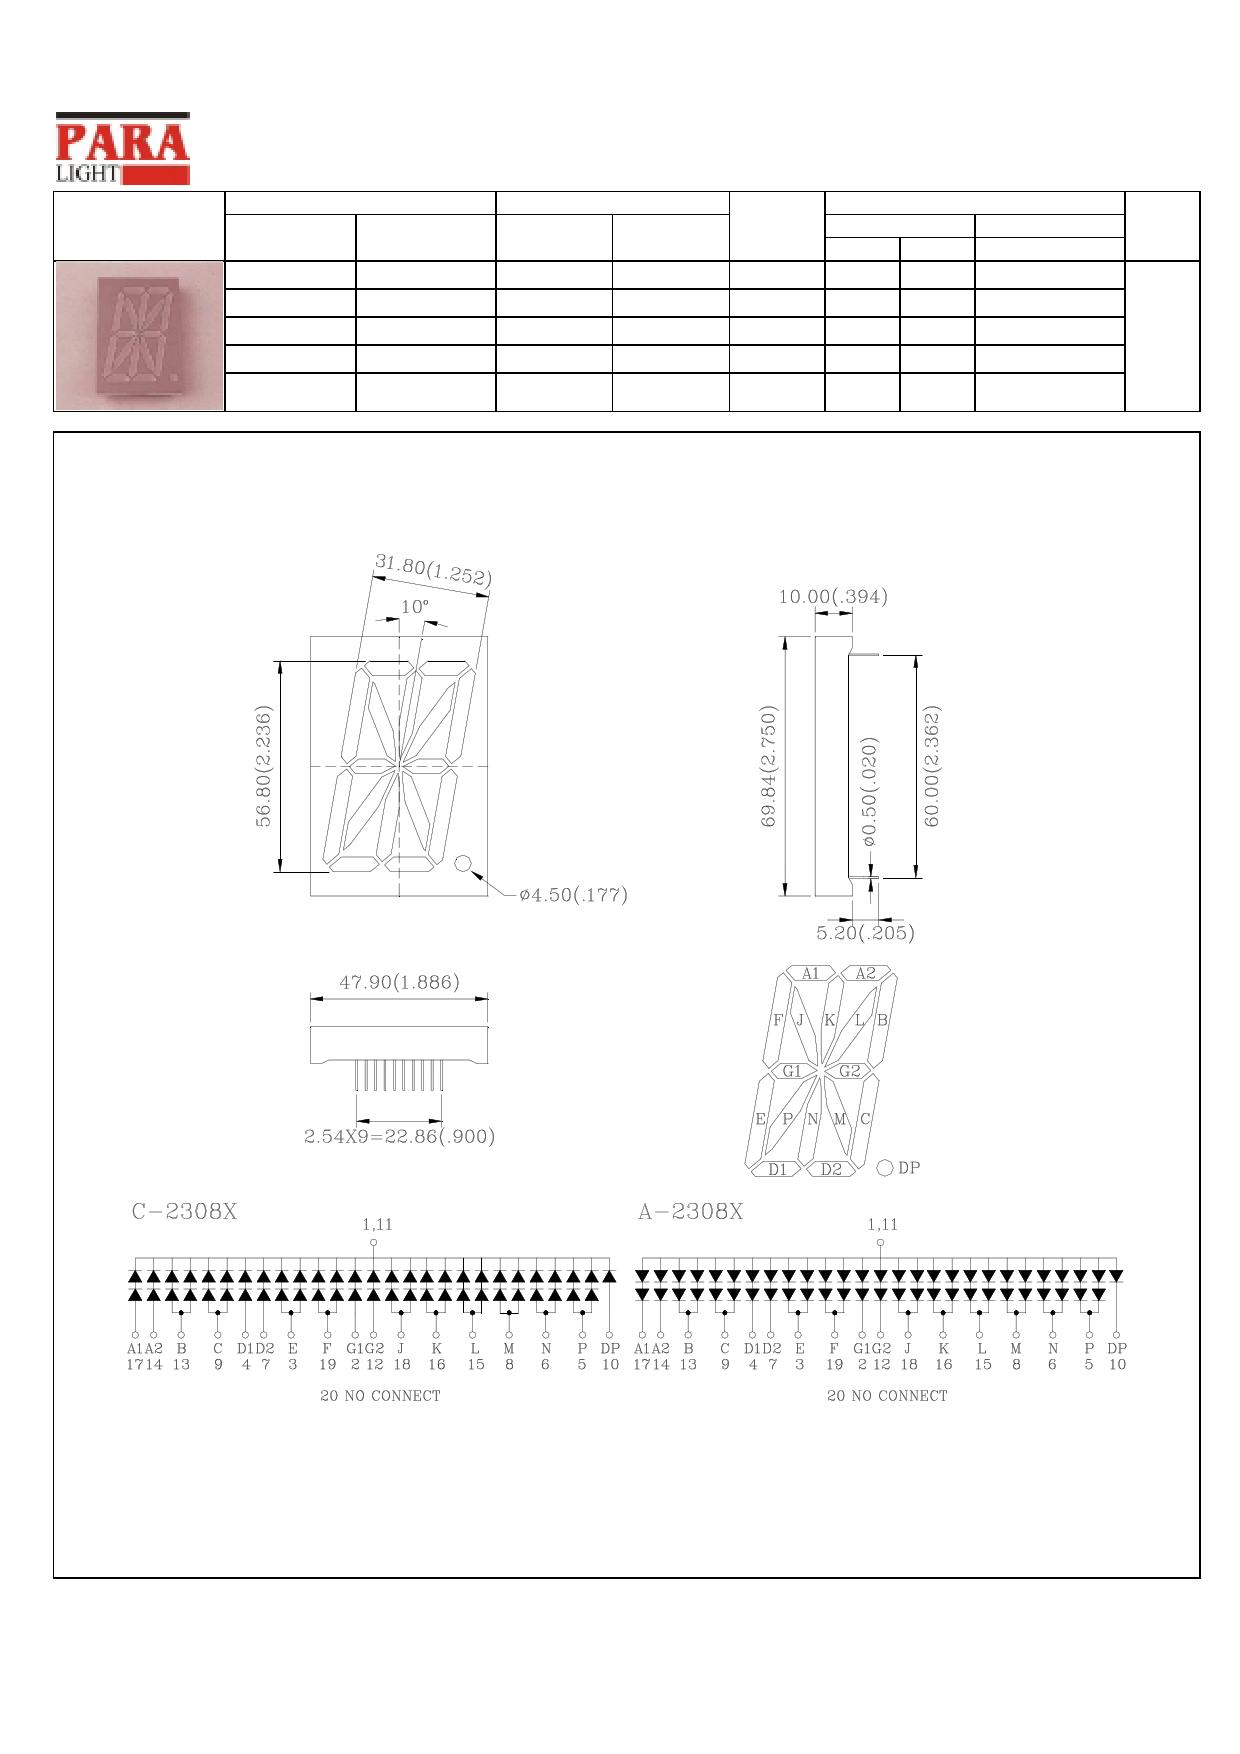 C-2308SR دیتاشیت PDF